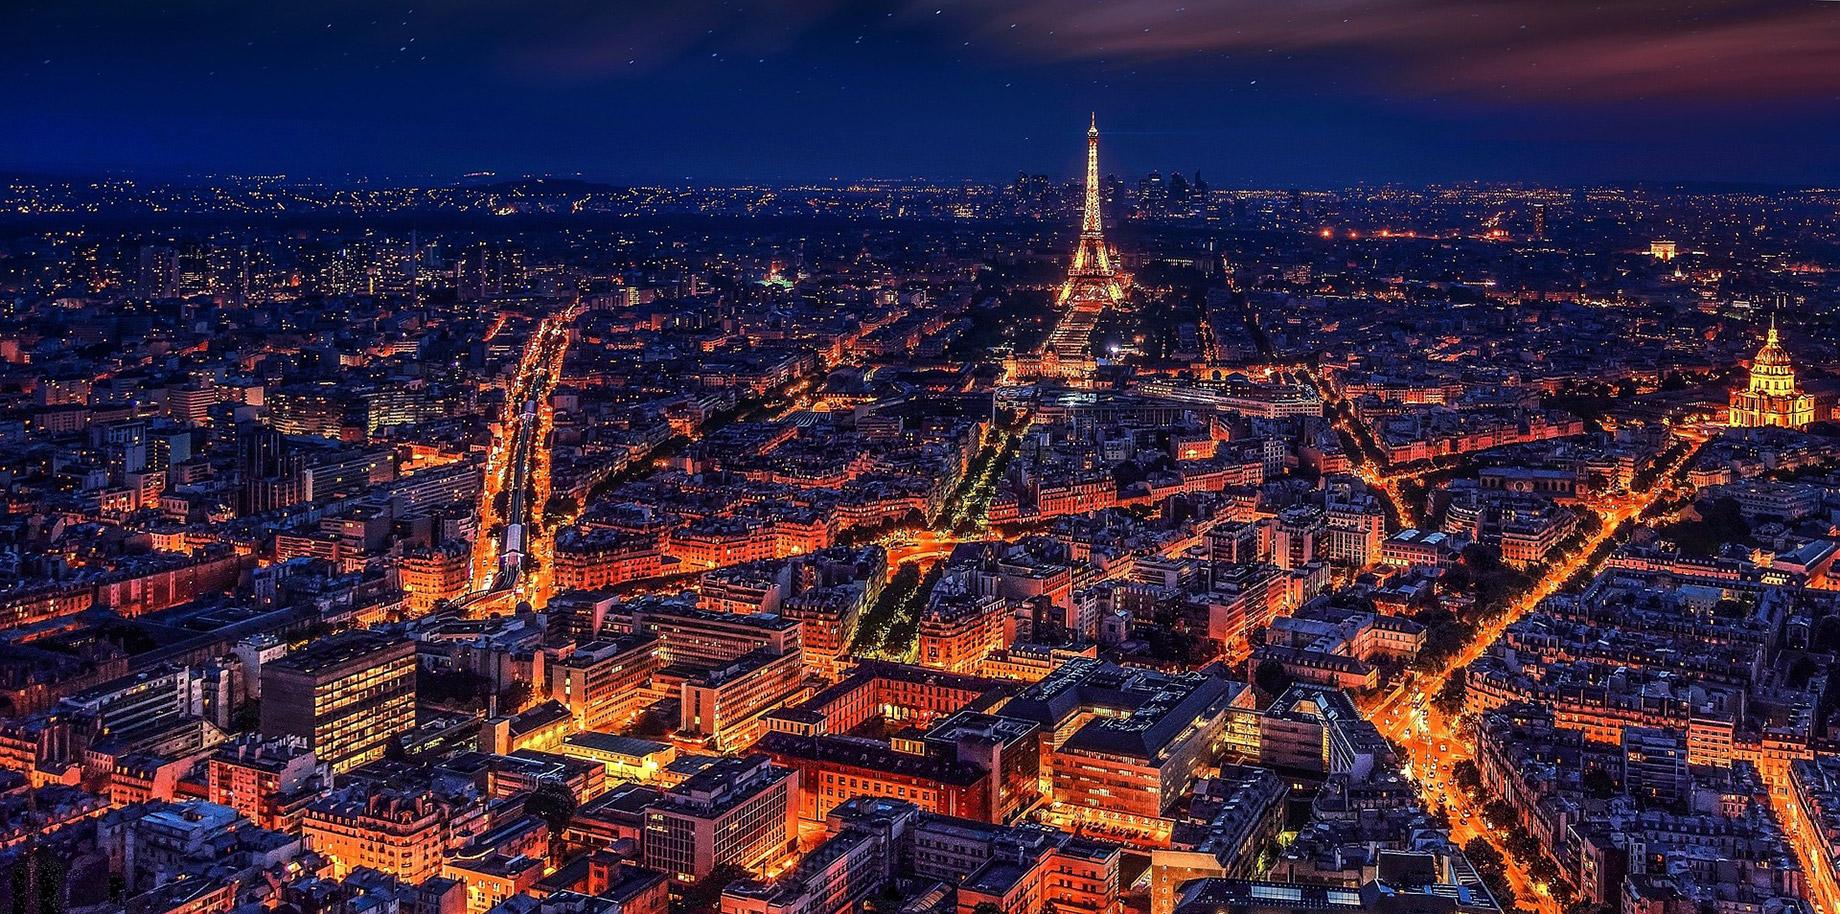 Paris, France at Night